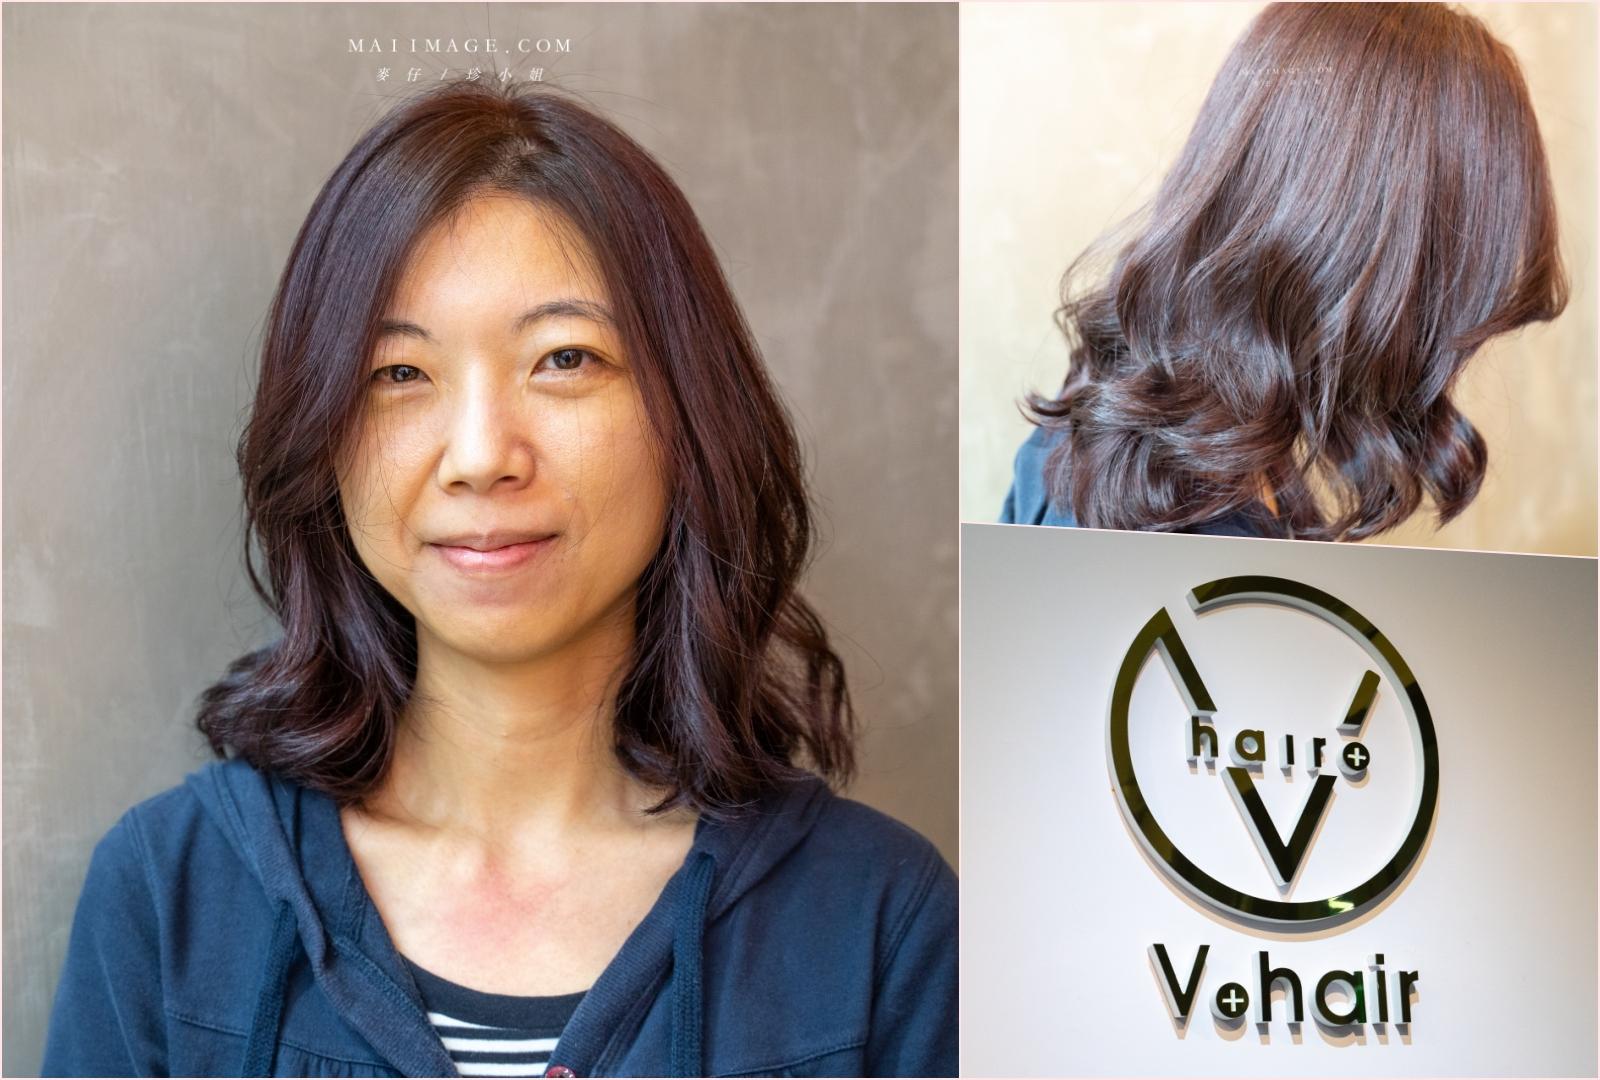 V+hair|珍小姐最愛設計師新開店,過年不漲價還有折扣優惠,台中逢甲髮型設計推薦,台中染髮、台中燙髮、